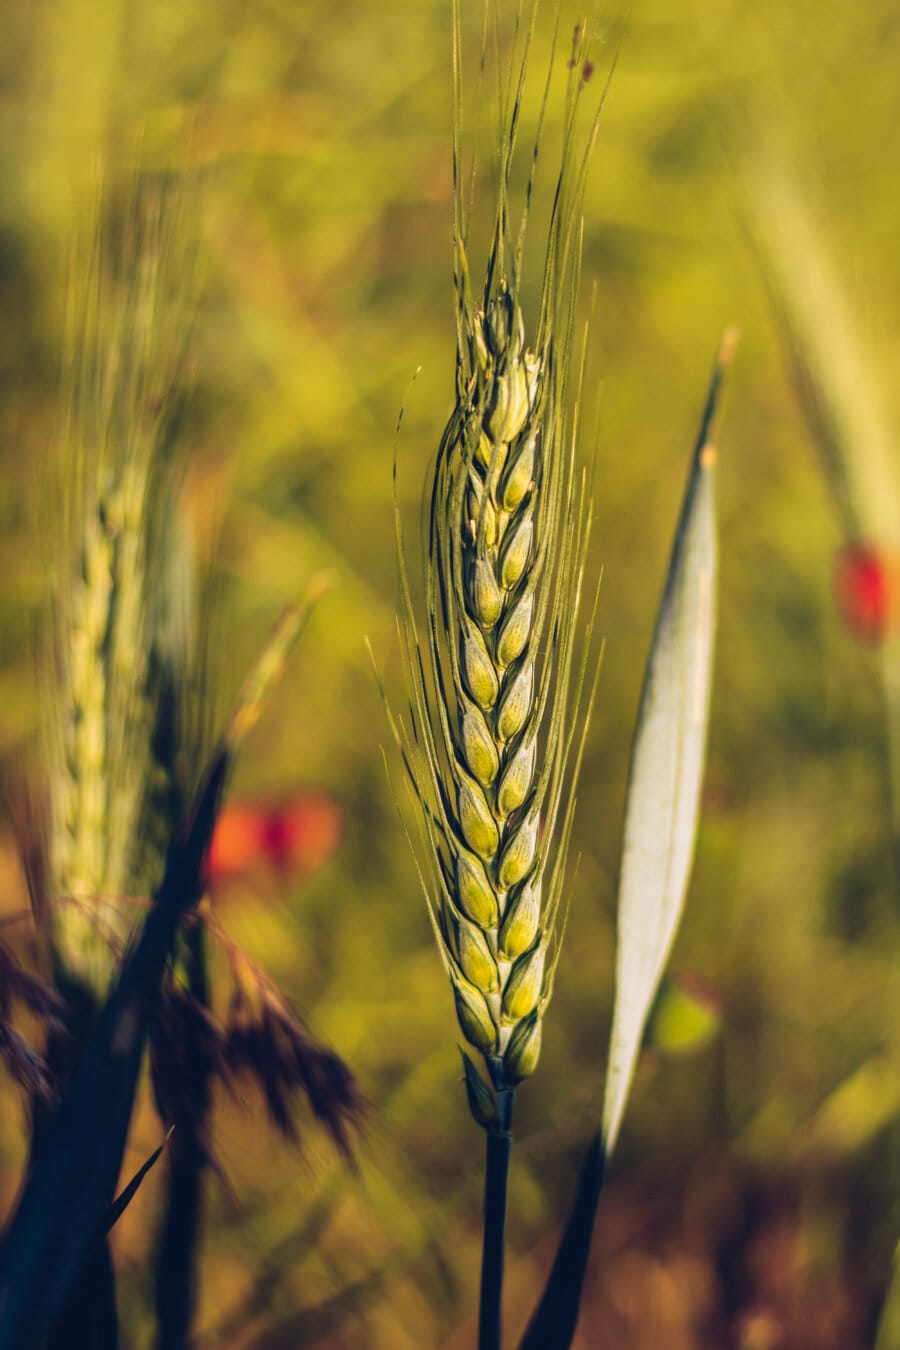 vete, Wheatfield, grönt blad, korn, Solljus, jordbruk, råg, Grain, spannmål, frö